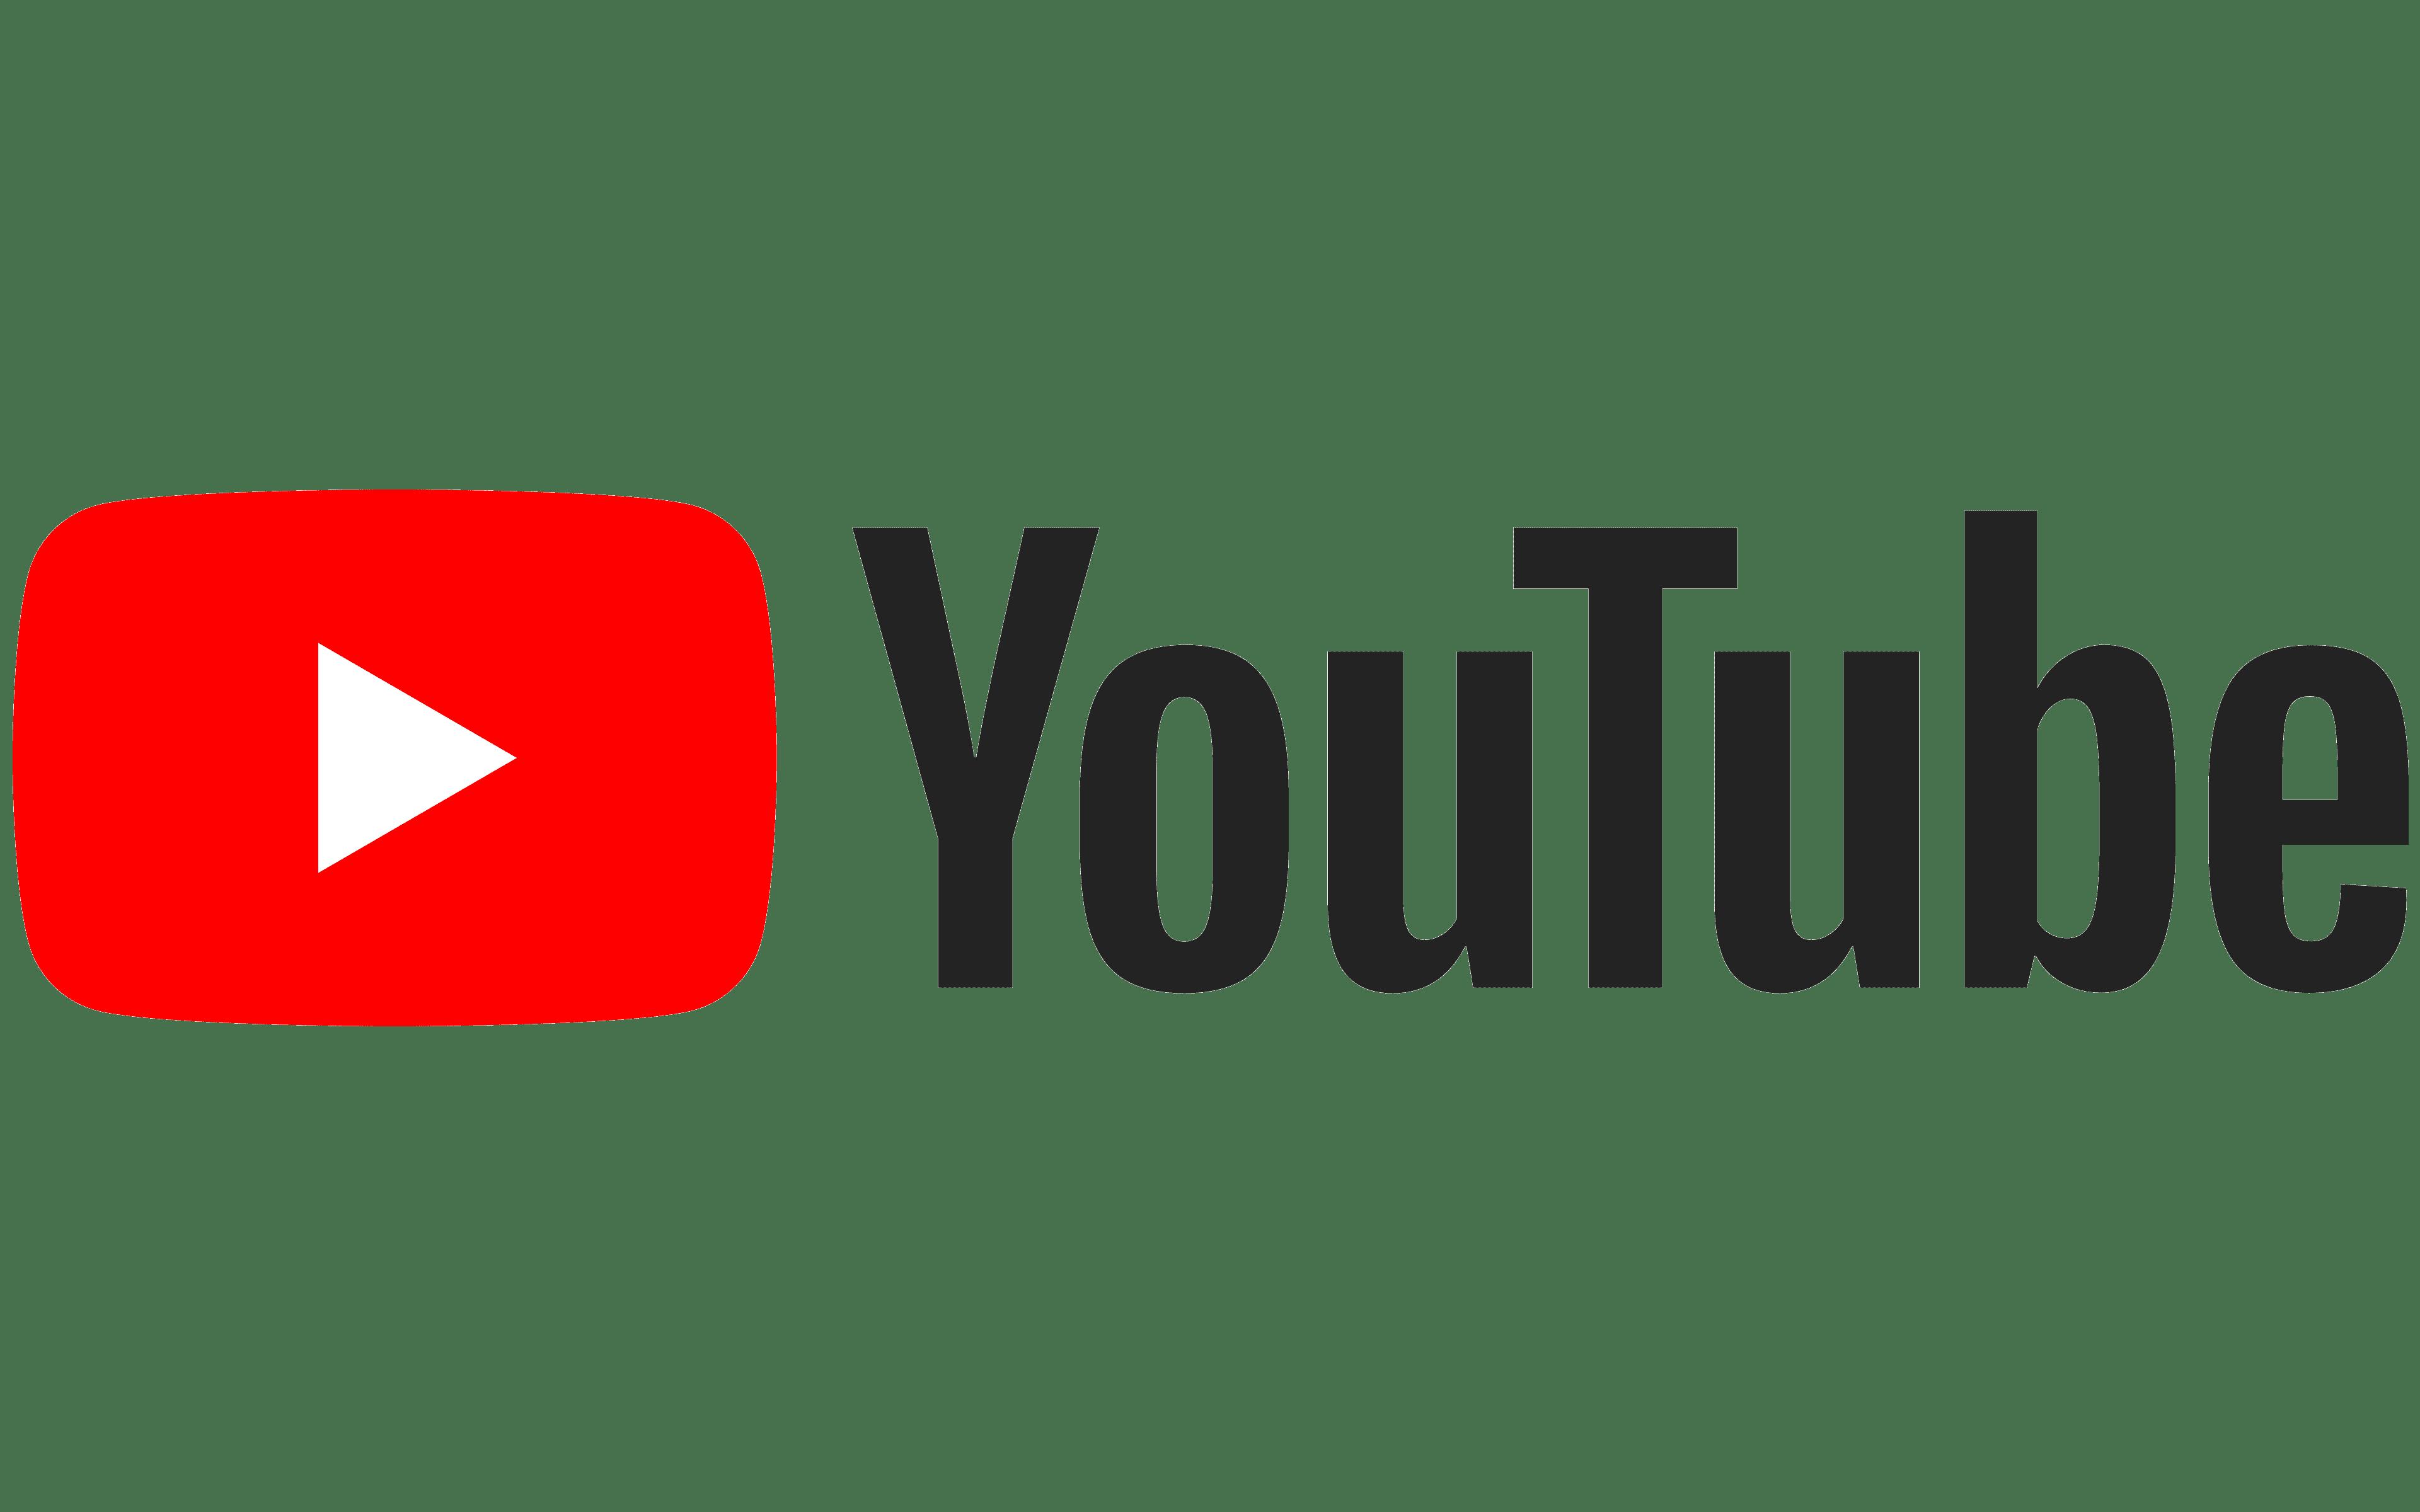 YouTube Marketing Agency London - YouTube Ads Agency London